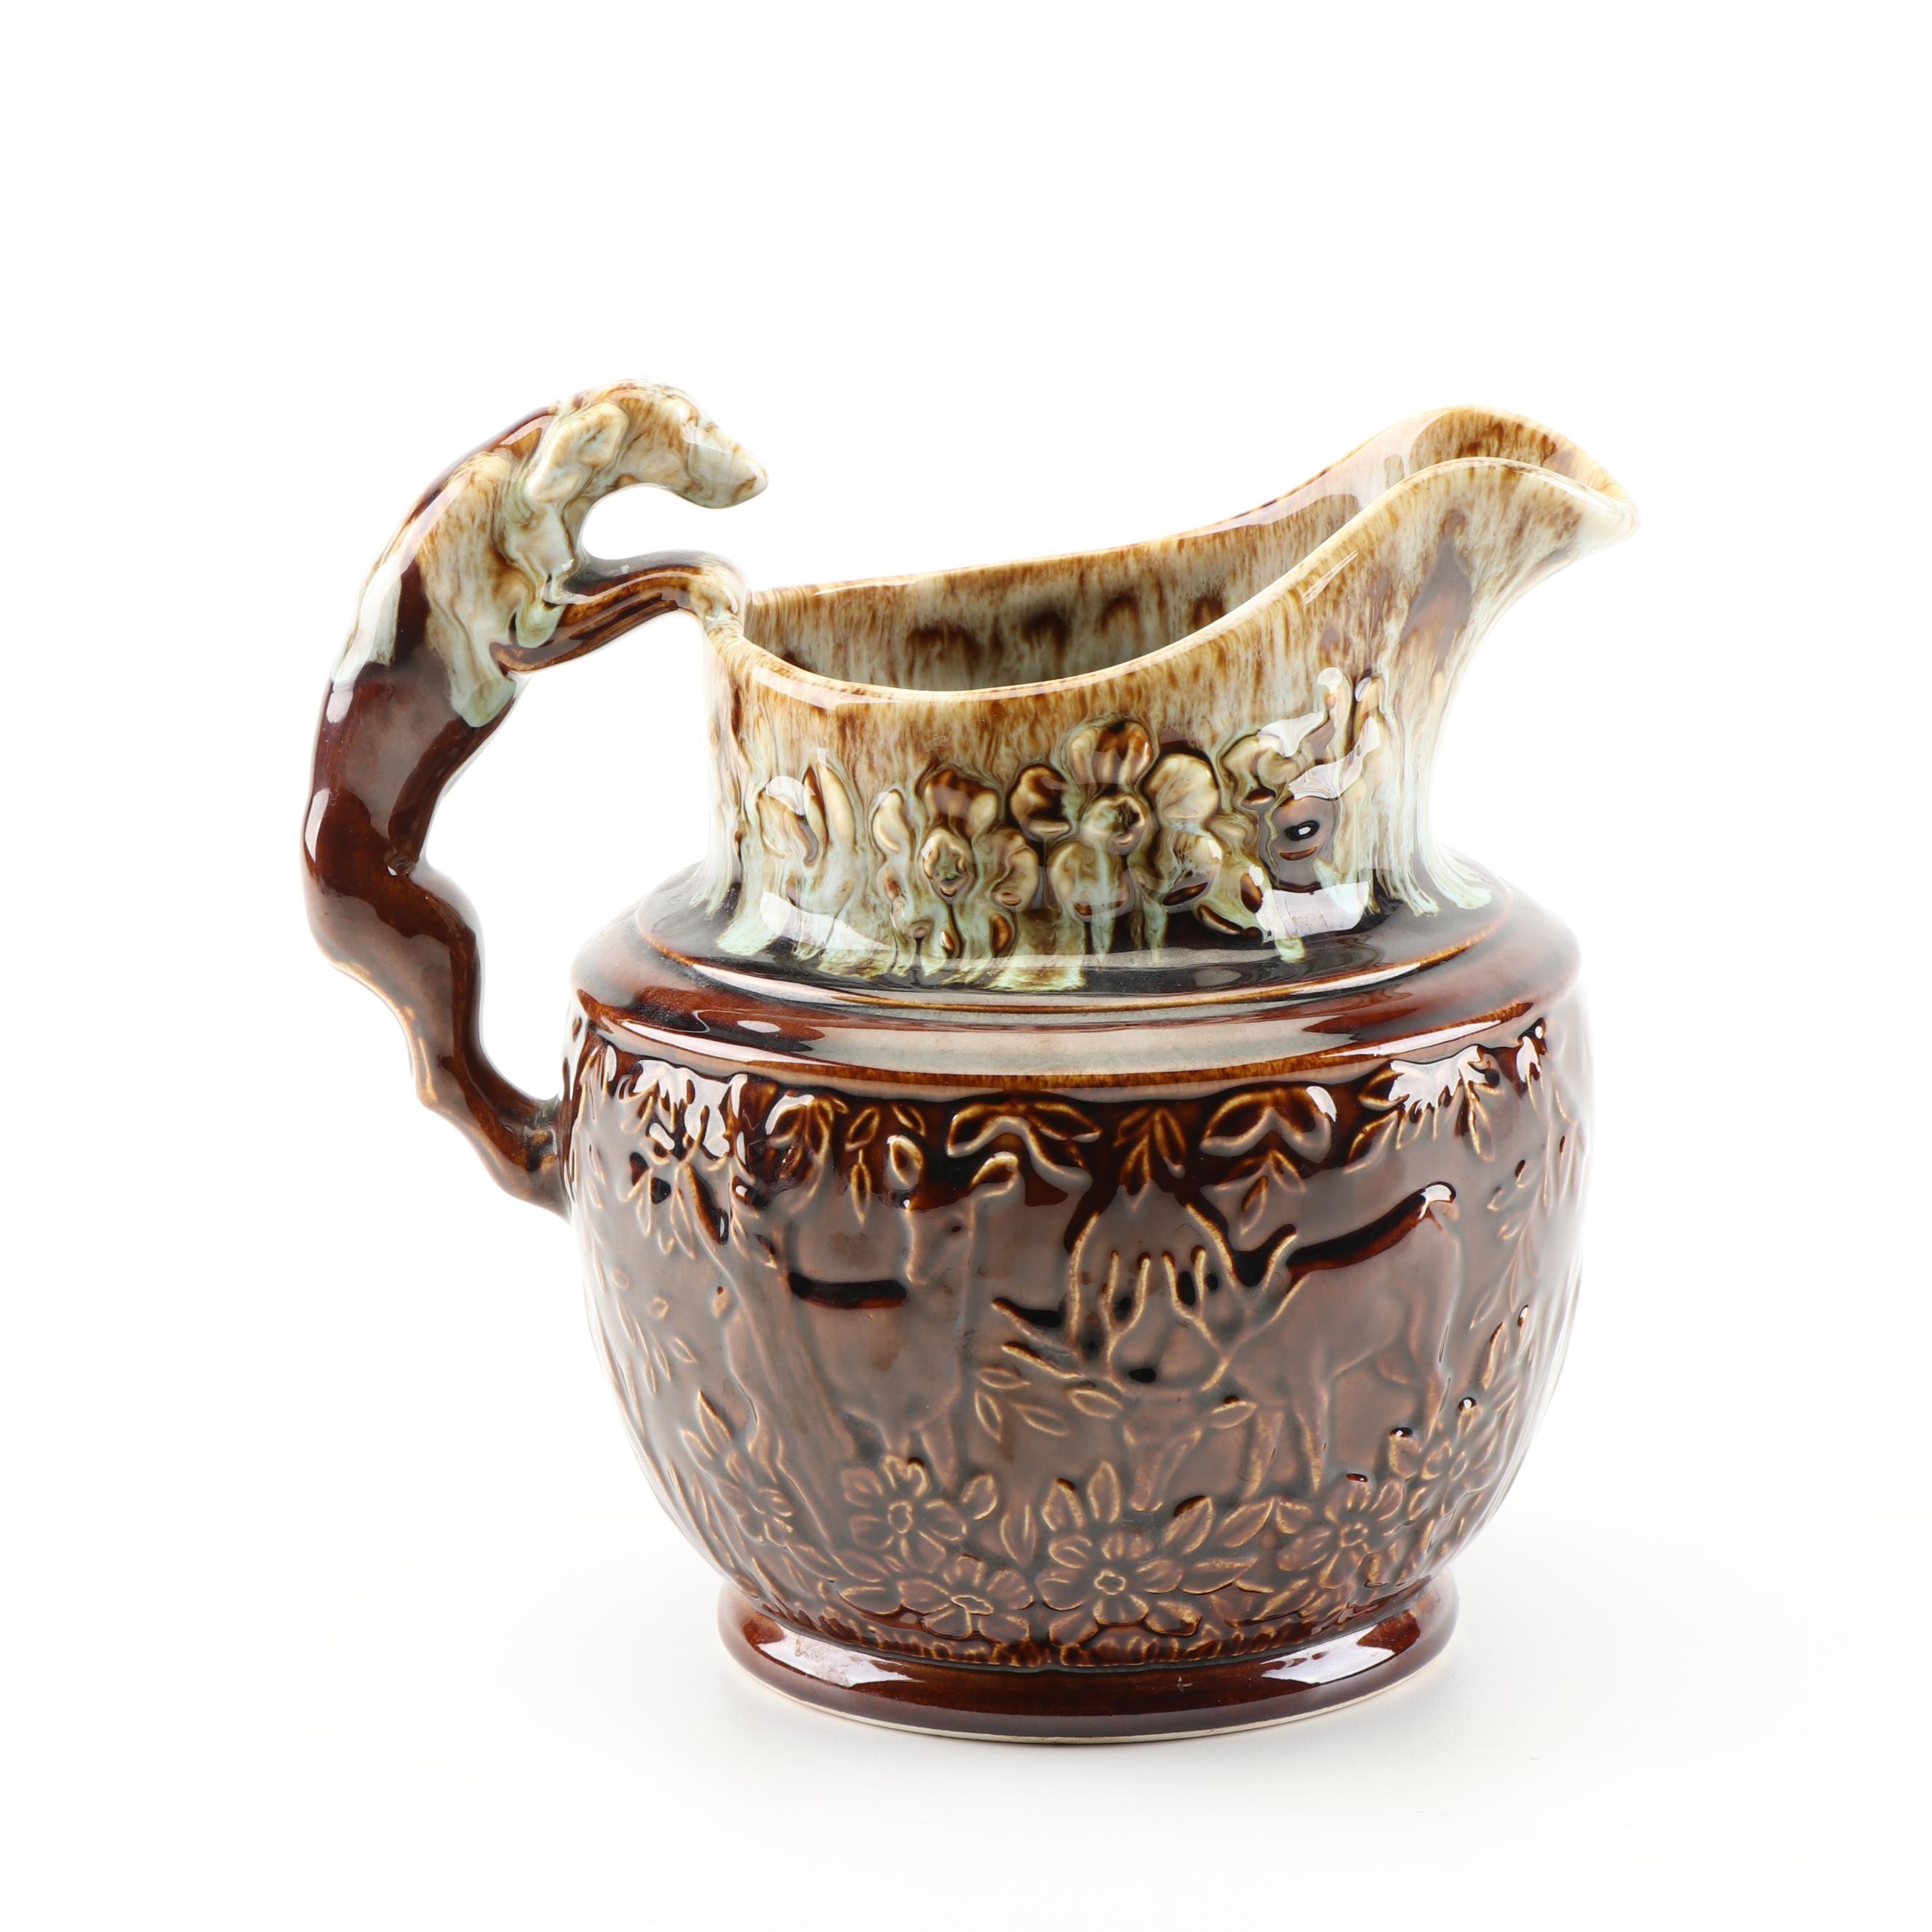 USA Pottery Reproduction Harker Rockingham Pitcher